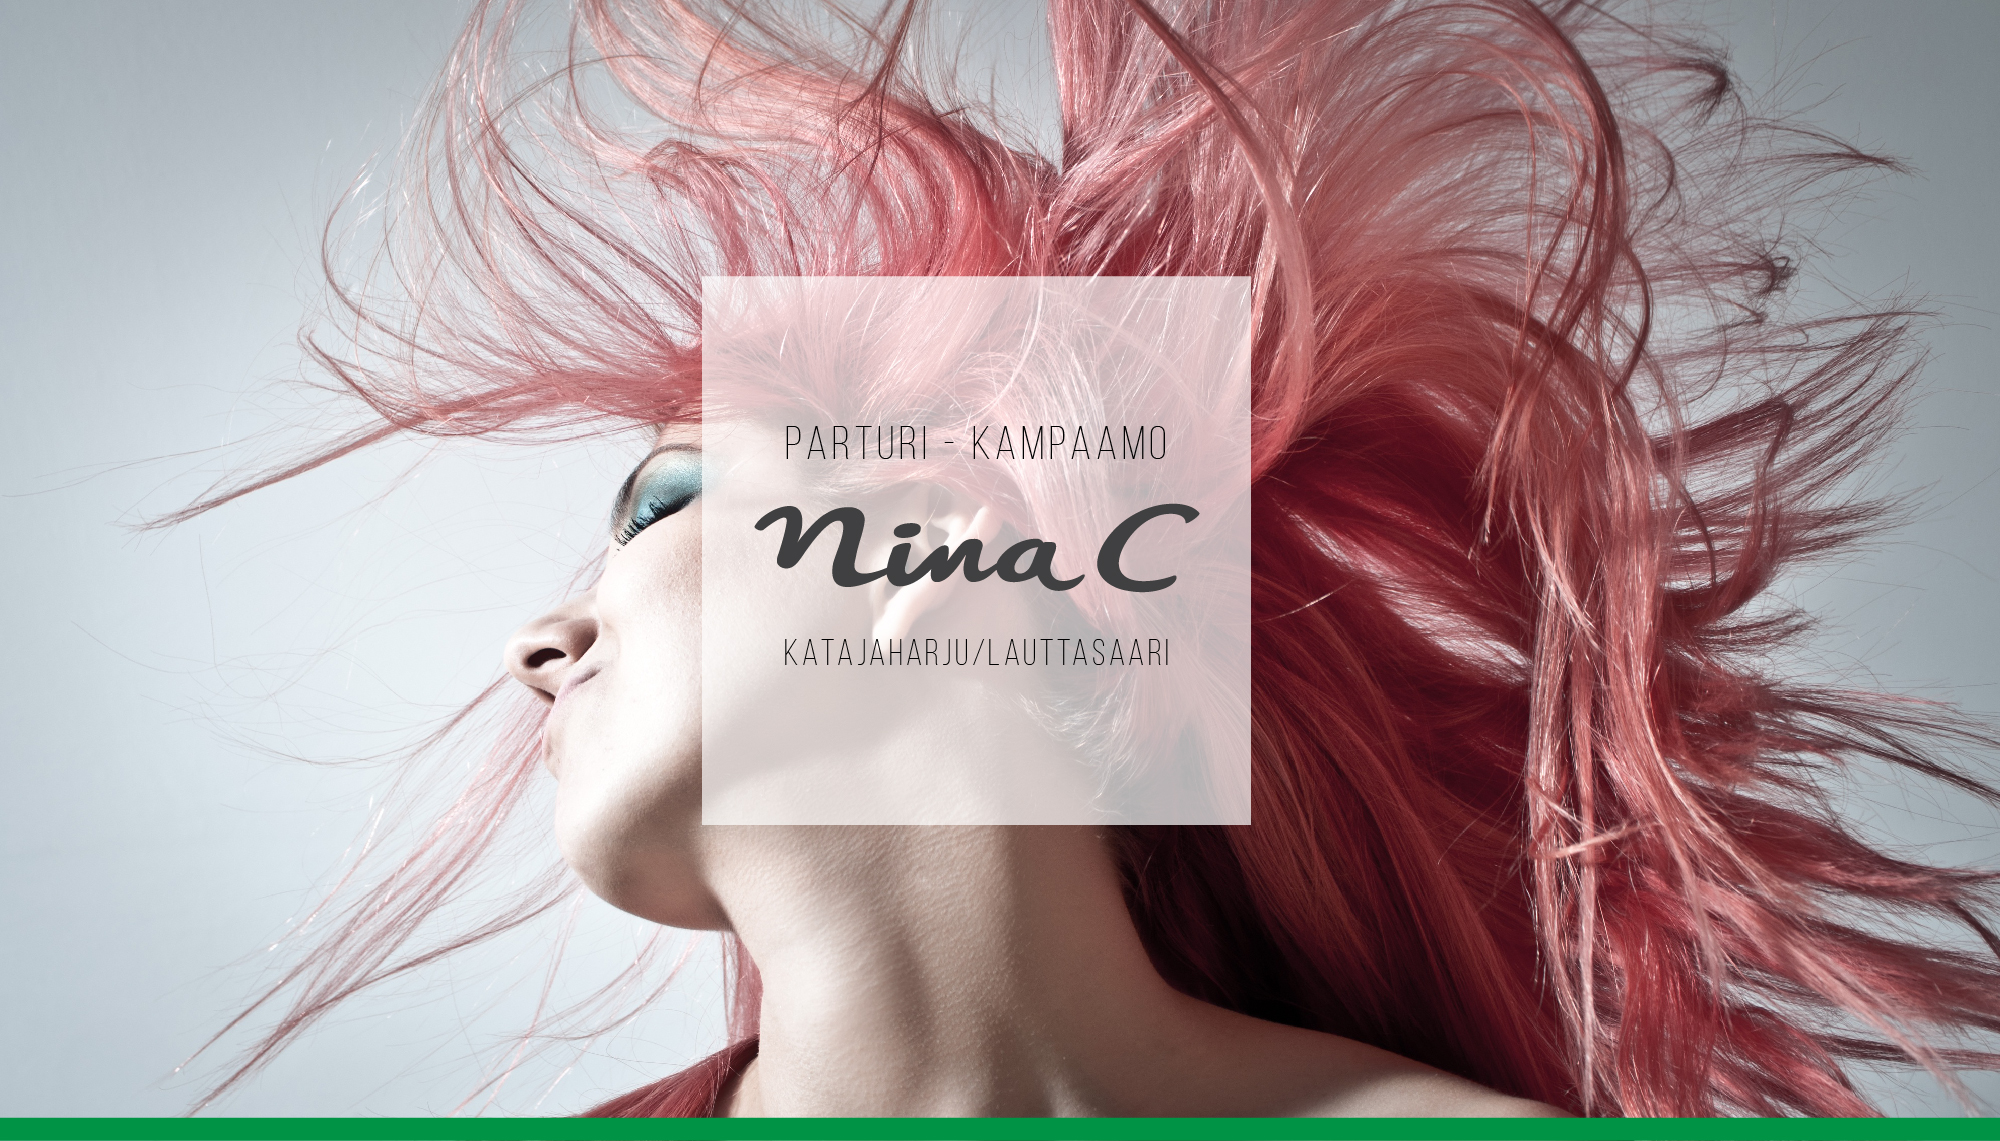 Ninac_carusel-01